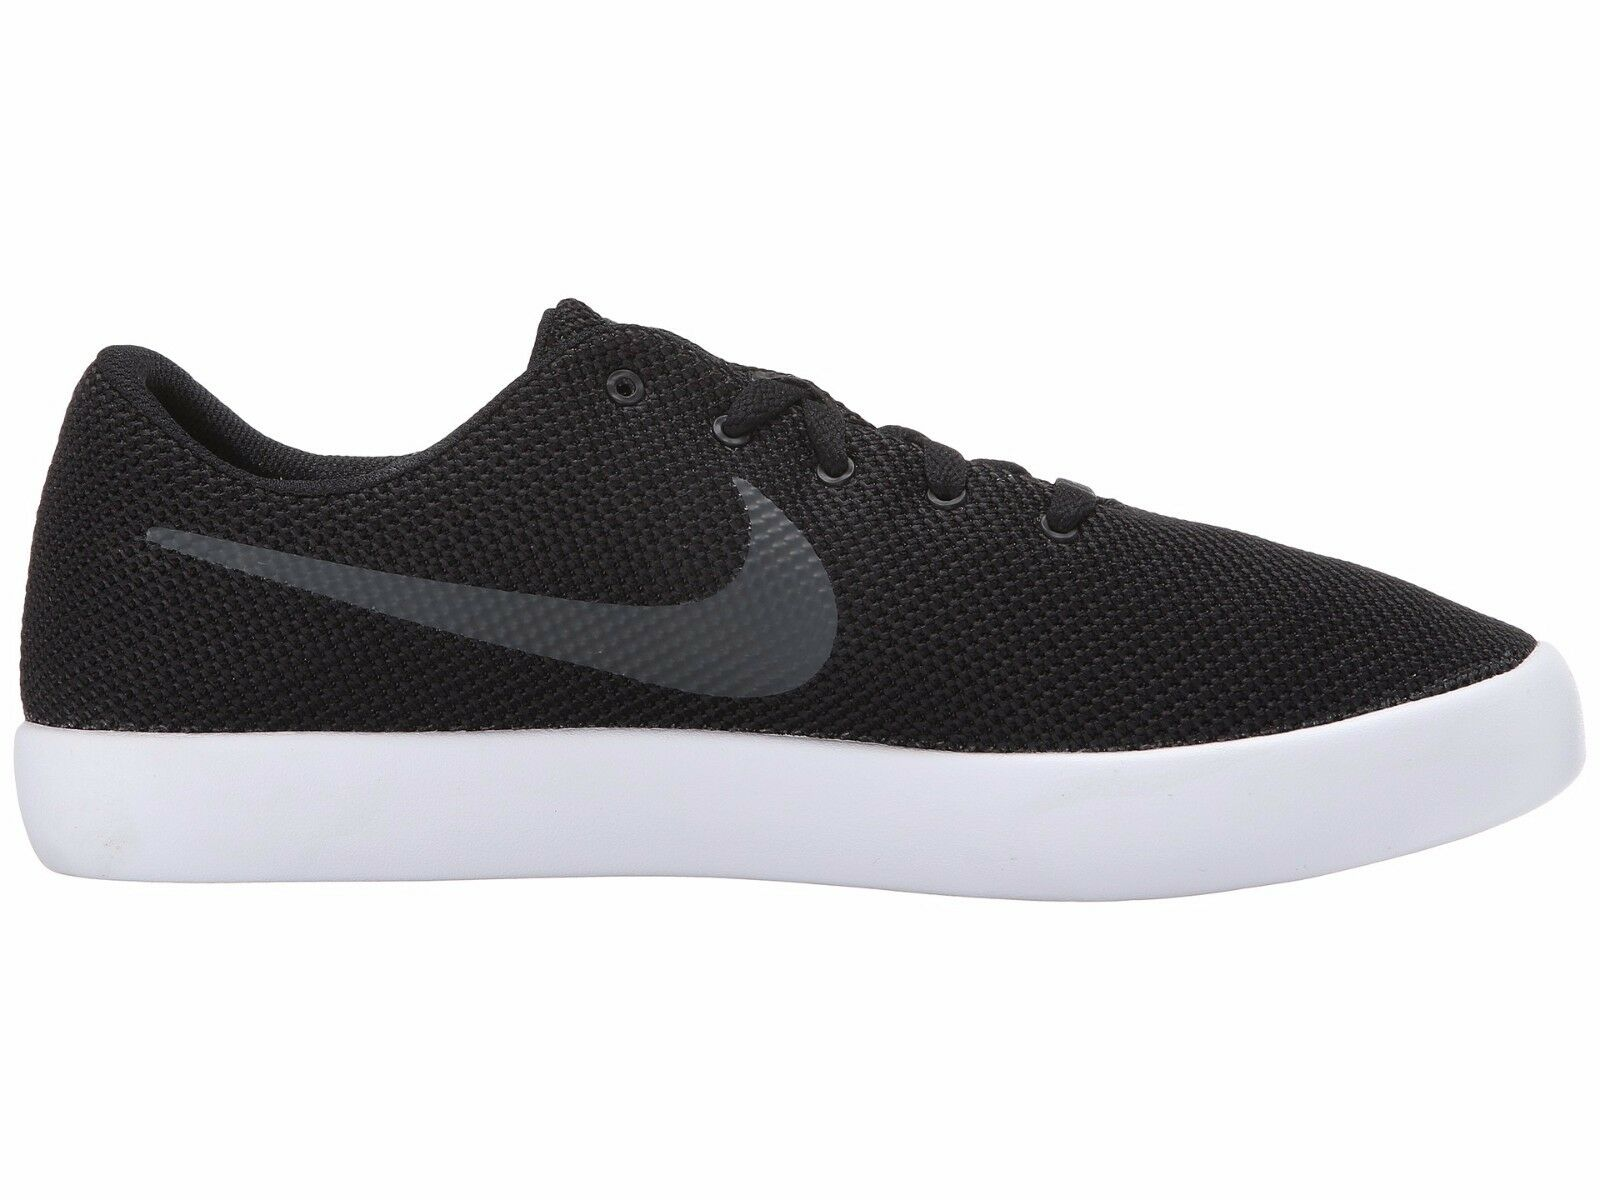 Nike Essentialist Casual Chaussures Noir/Blanc